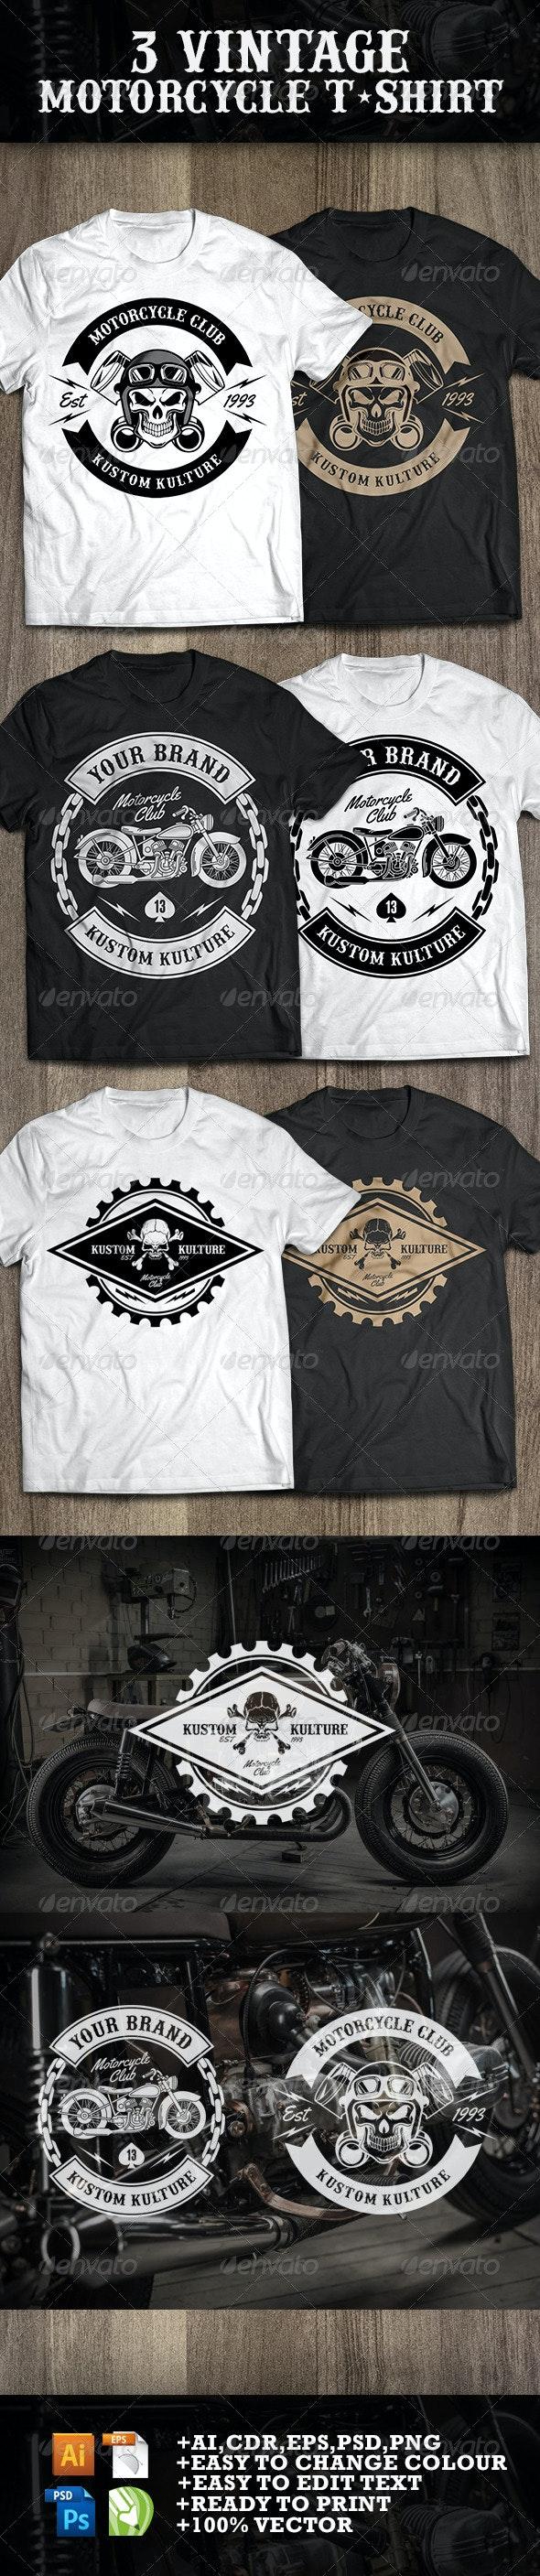 3 Vintage T-shirt Motorcycle - Sports & Teams T-Shirts